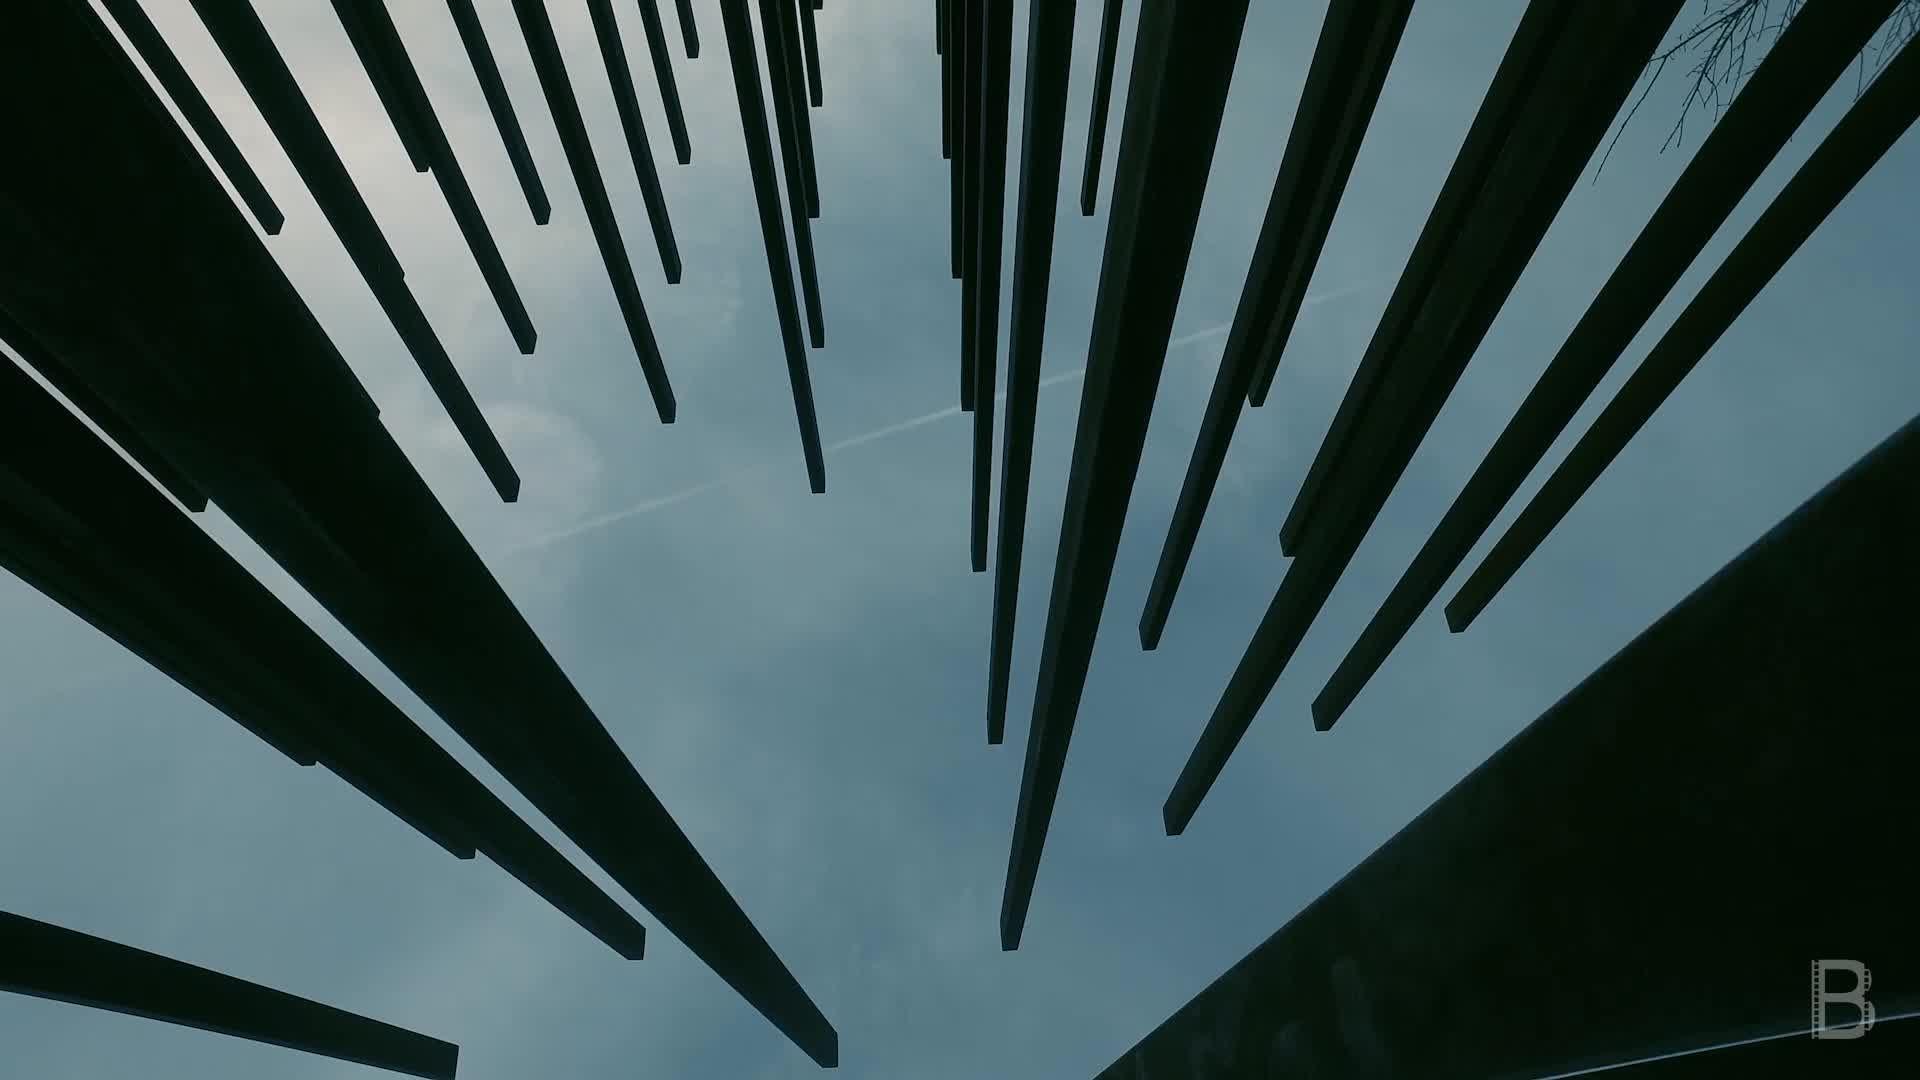 BELLA Presents: daily bello S1 Ep14 Sculpture Upside Down